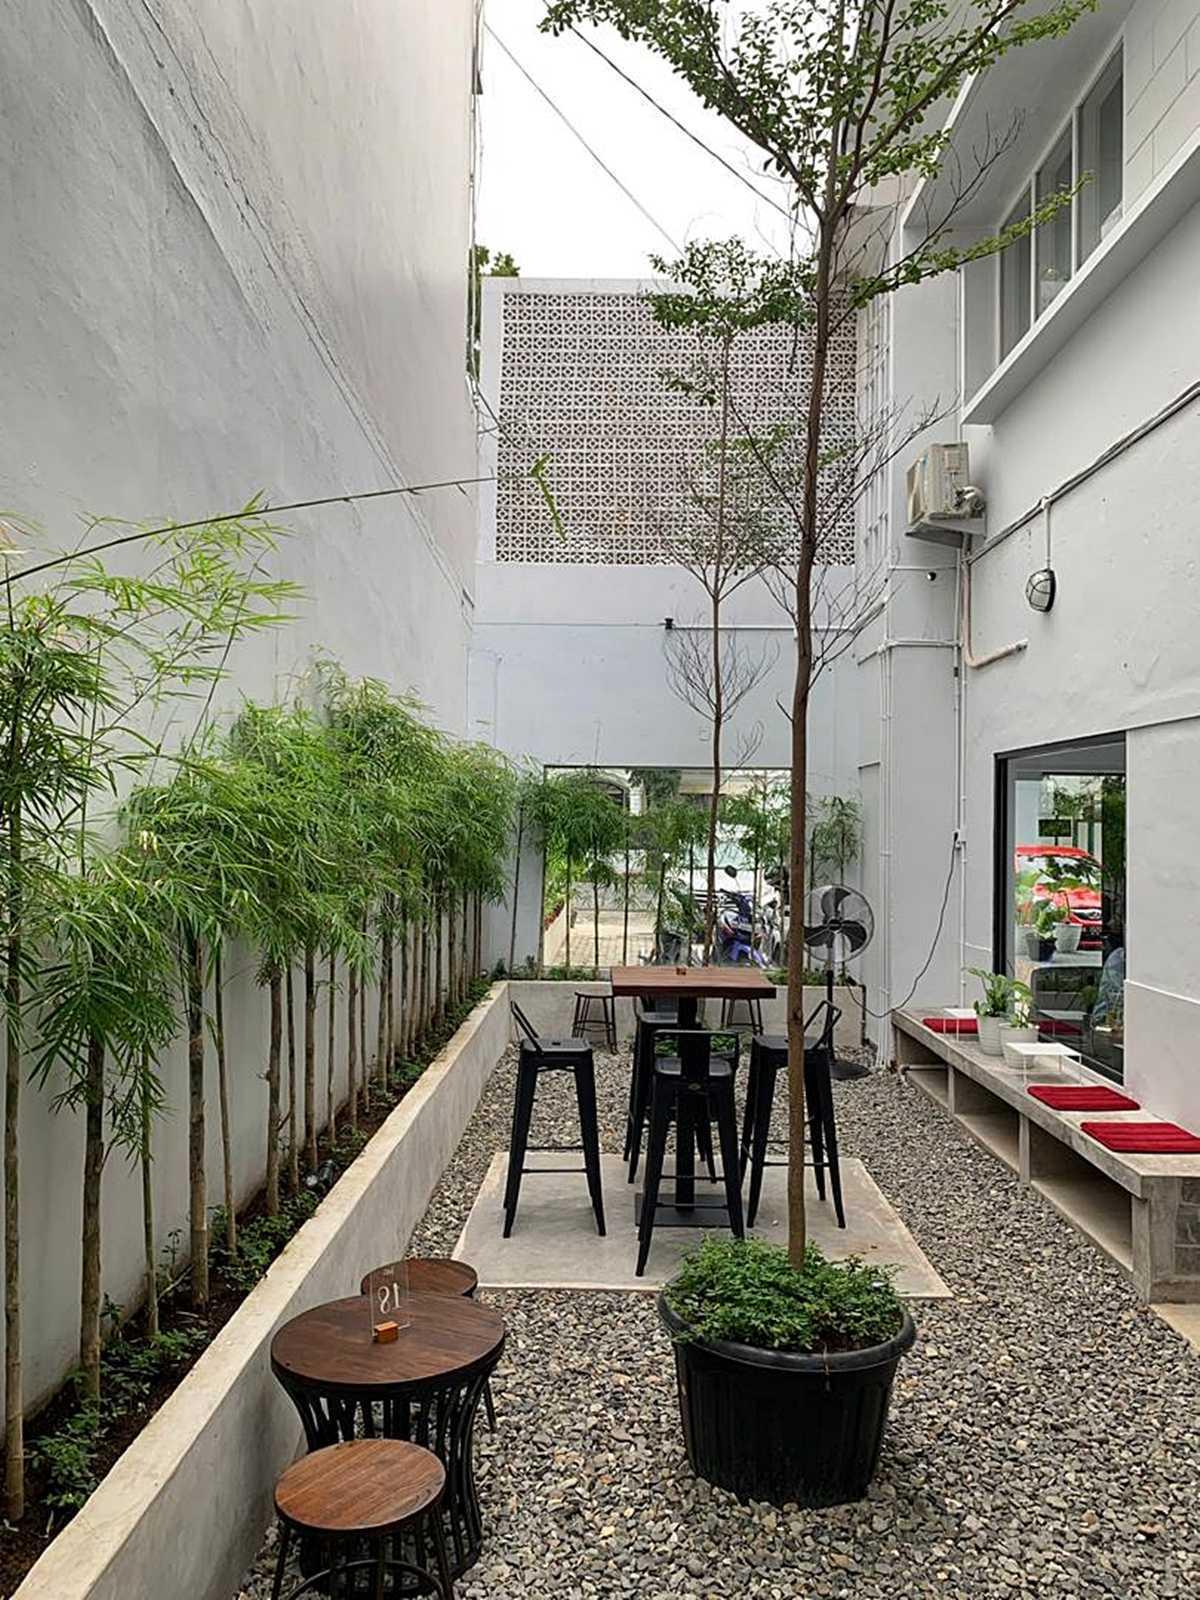 Bd Studio Tamoe Coffee & Resto Medan, Kota Medan, Sumatera Utara, Indonesia Medan, Kota Medan, Sumatera Utara, Indonesia Bd-Studio-Tamoe-Coffee-Resto  80742